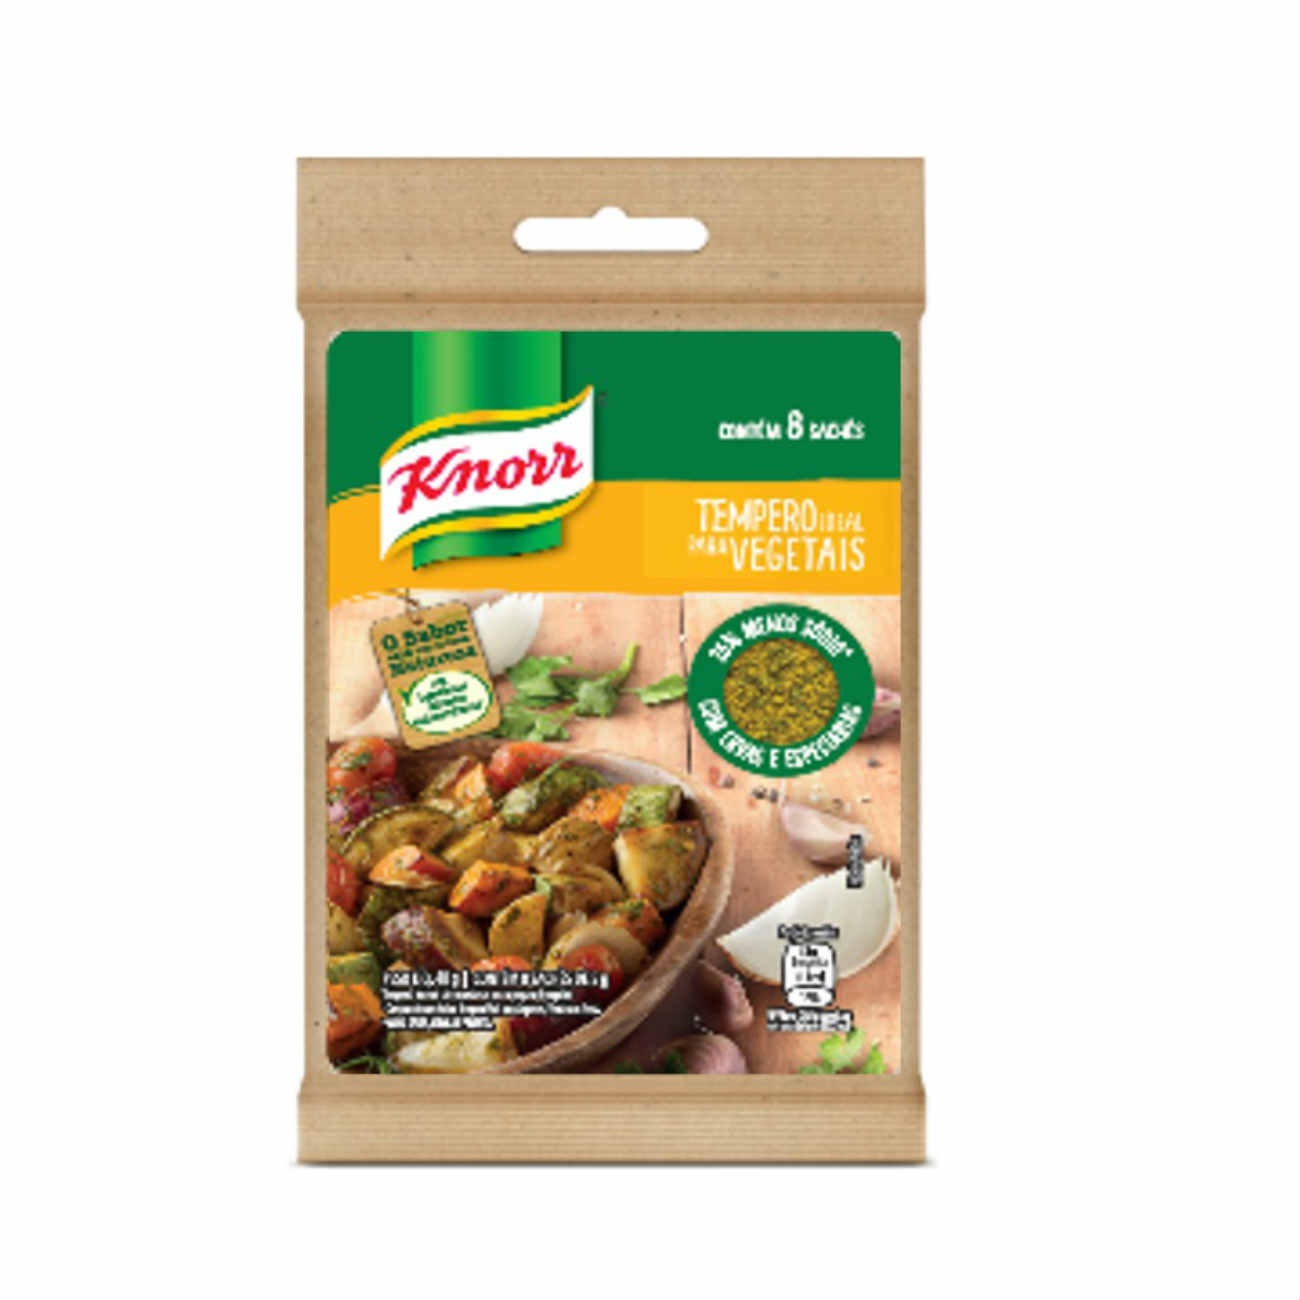 Tempero Knorr Ideal para Vegetais 40g